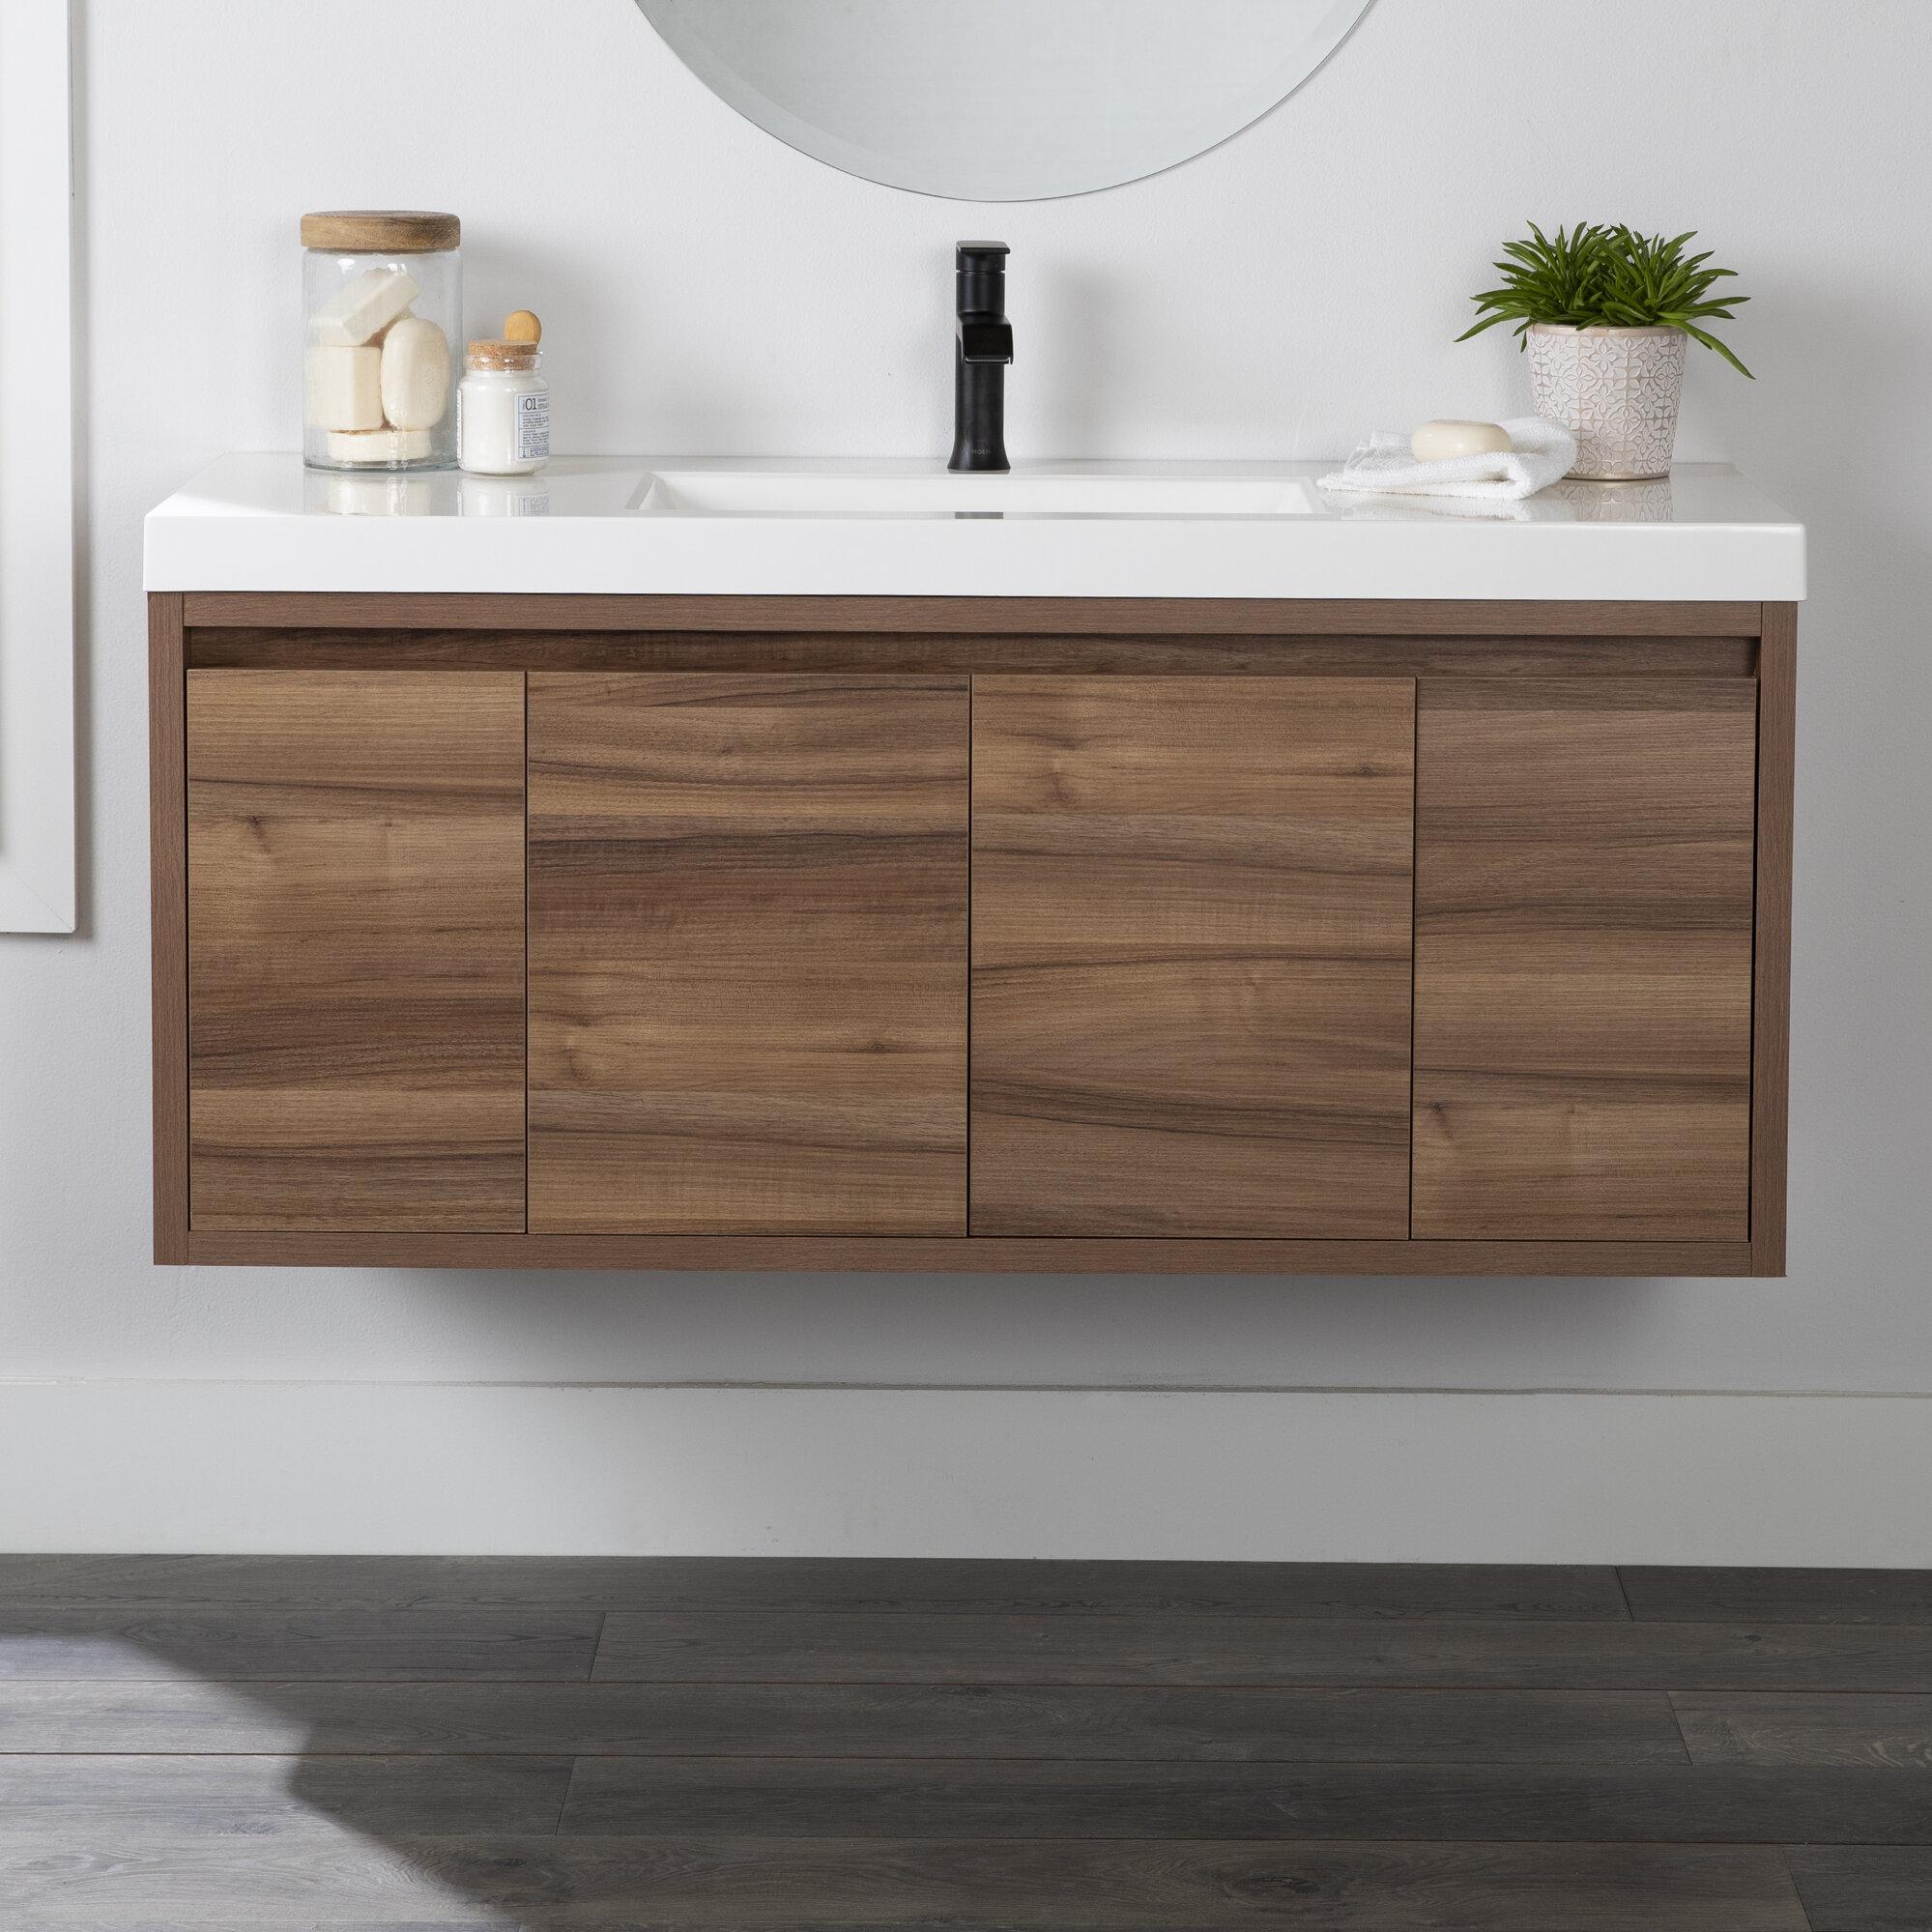 Union Rustic Rachal 49 Wall Mounted Single Bathroom Vanity Set Reviews Wayfair